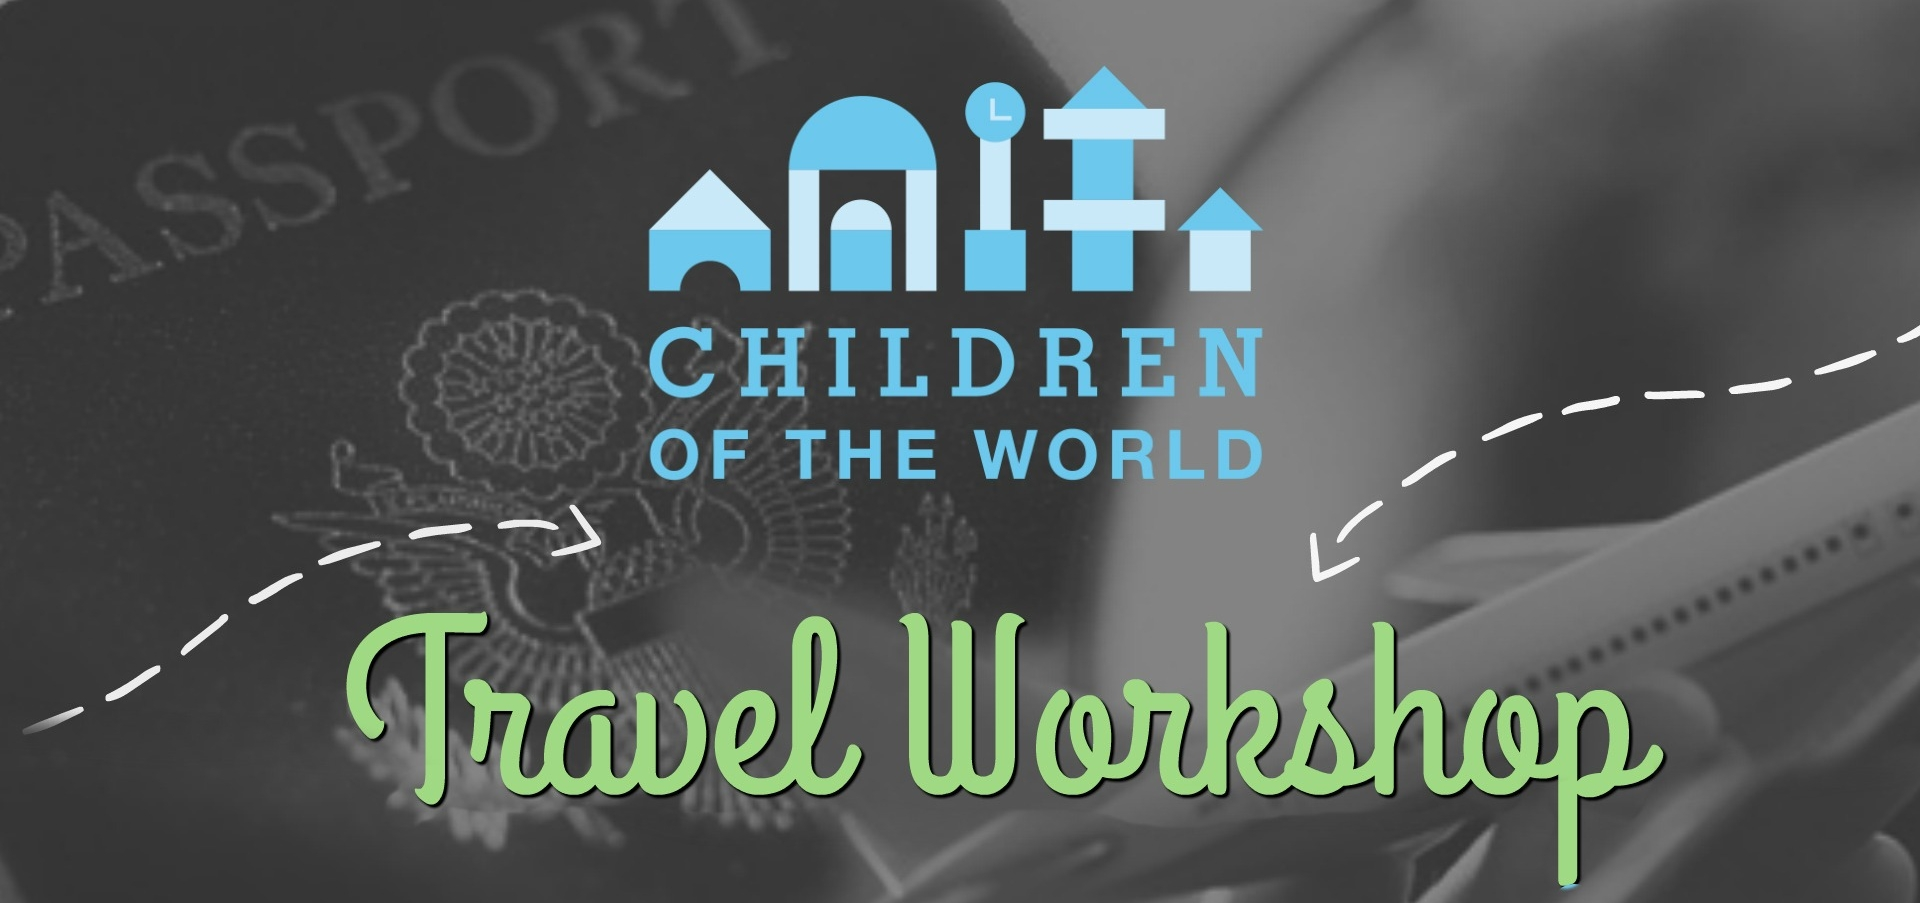 travel workshop.jpg